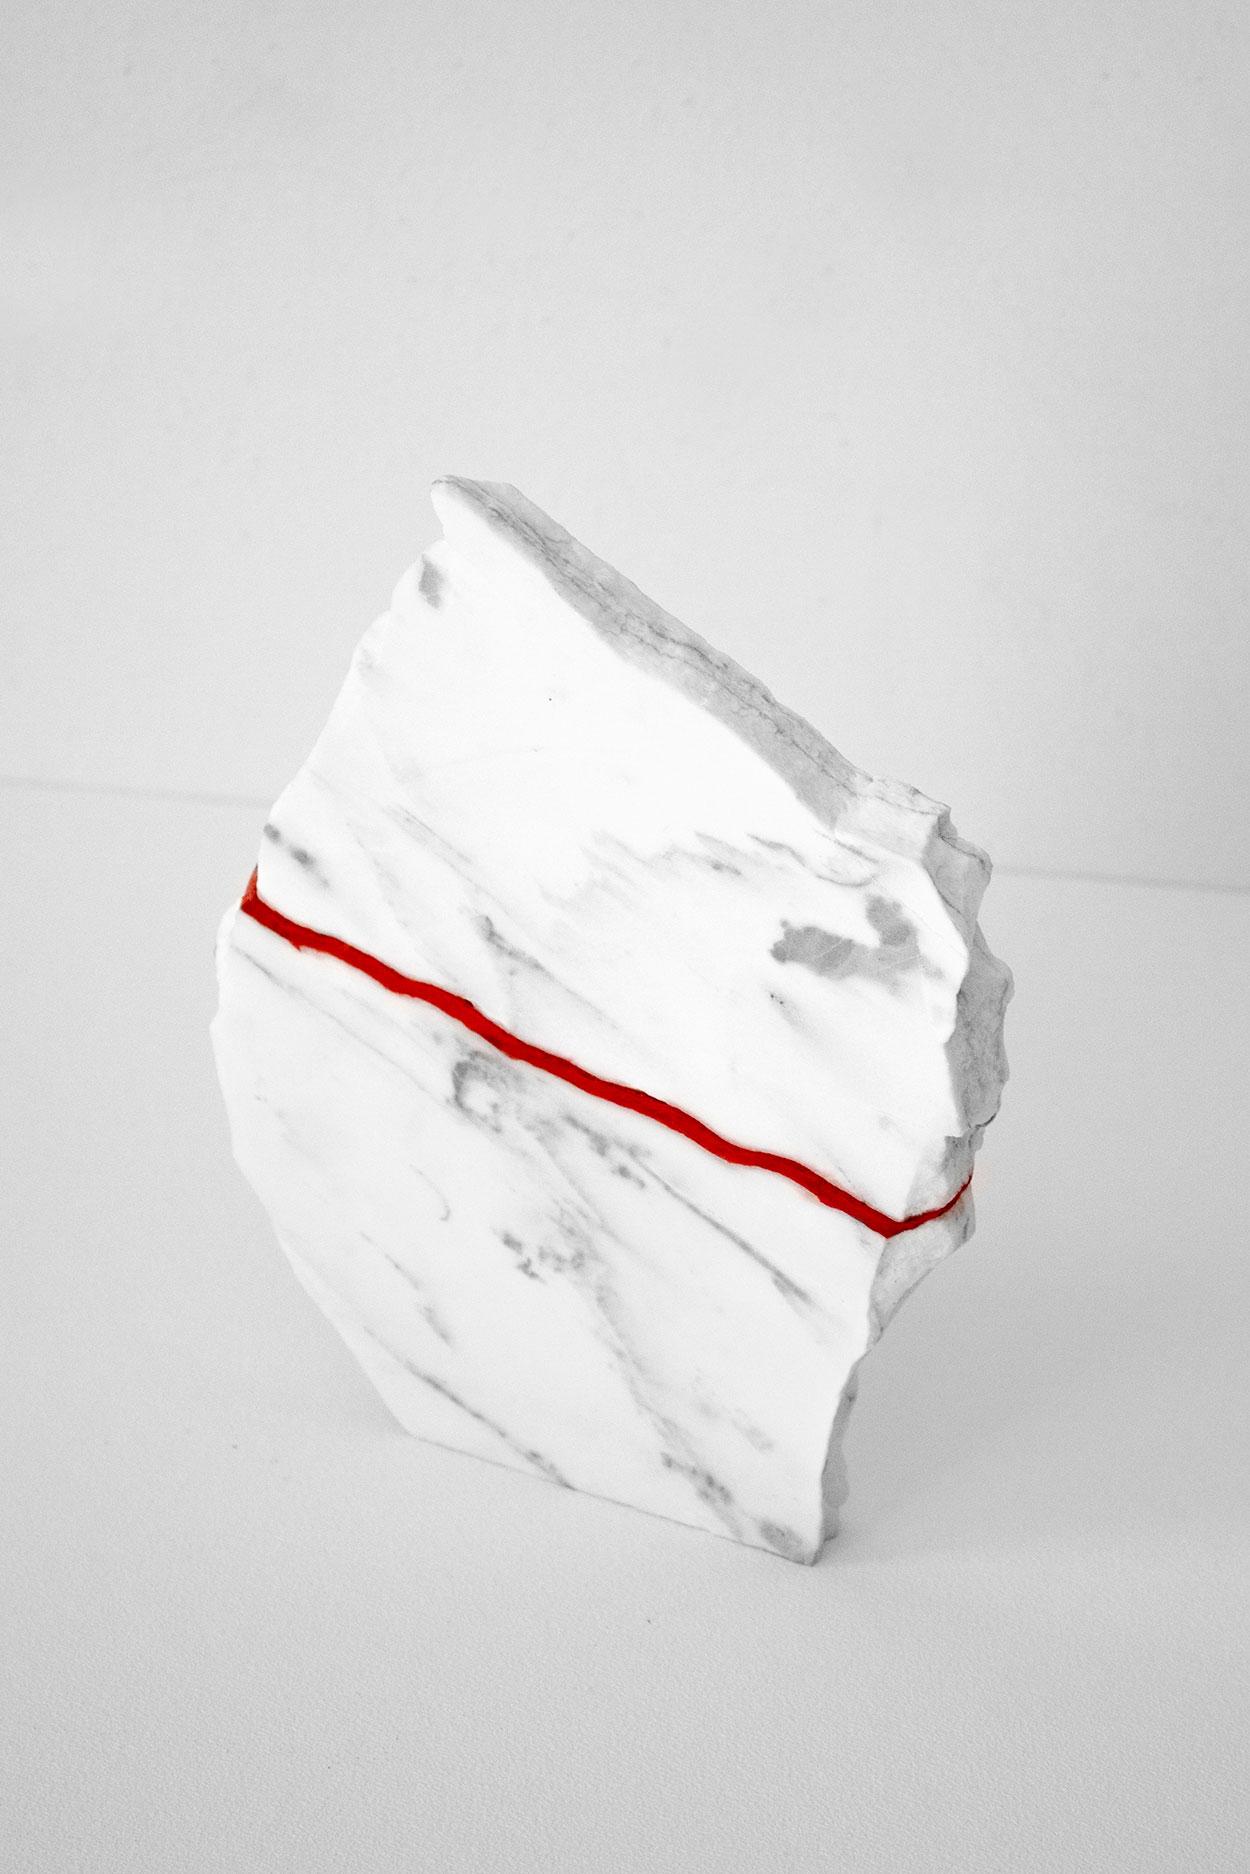 Carla Cascales' Sculpture Project, Broken | Yellowtrace